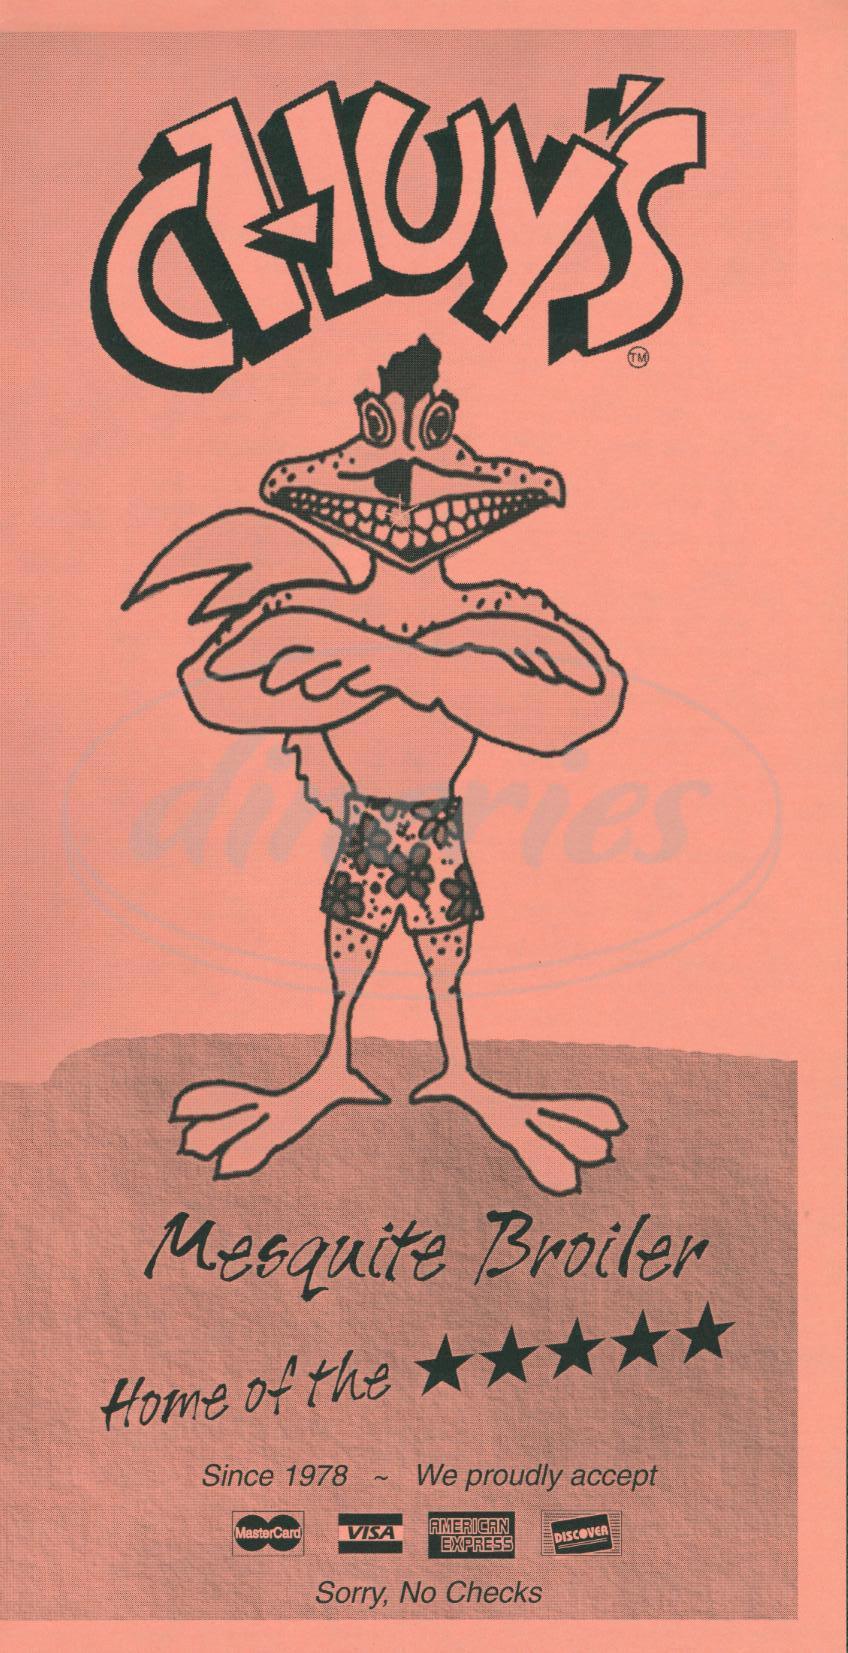 menu for Chuy's Mesquite Broiler